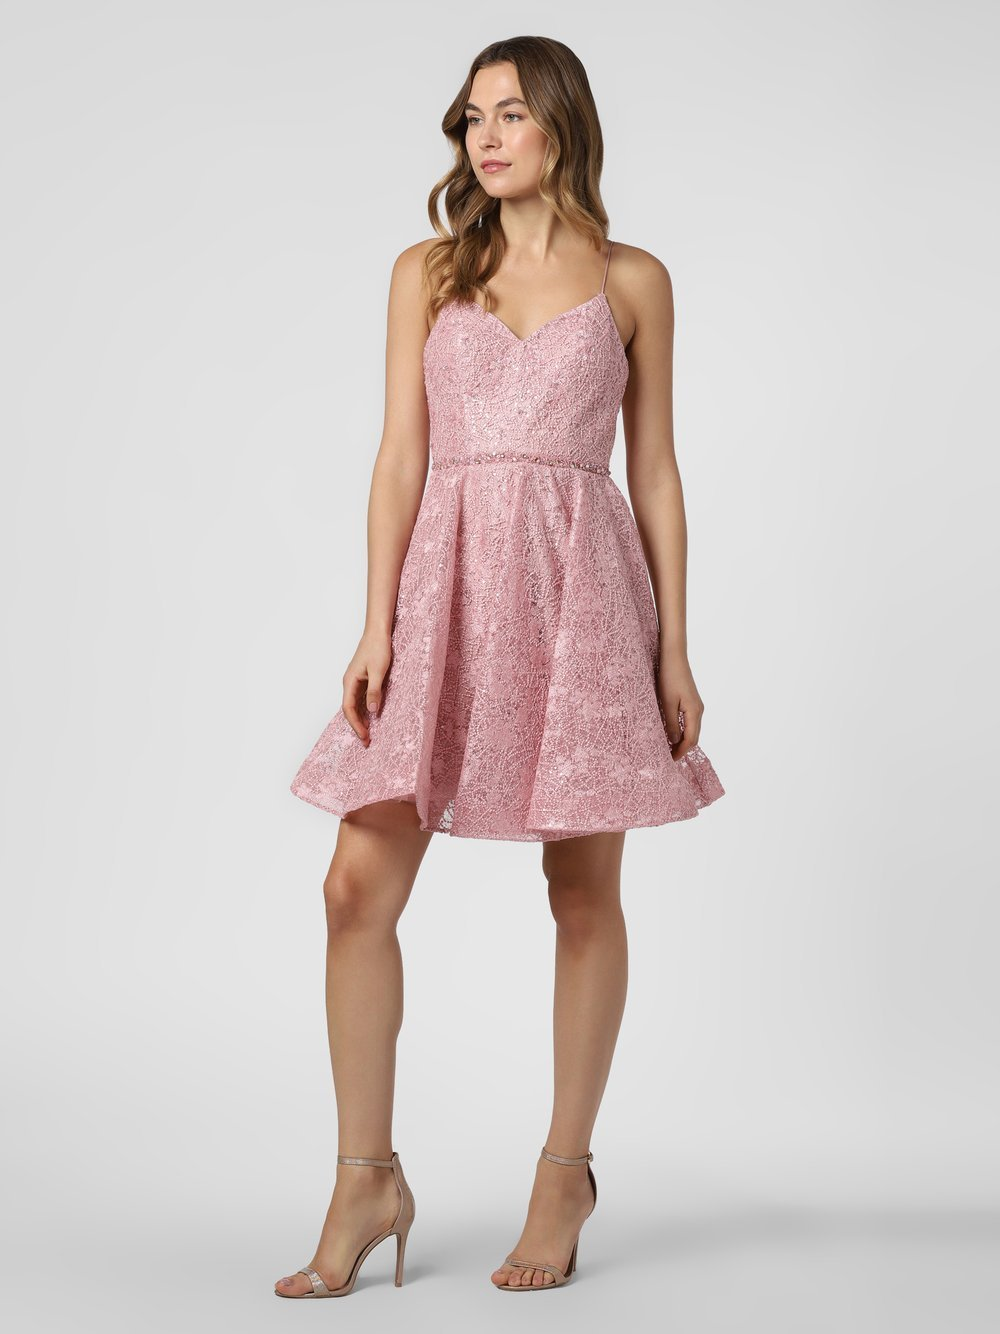 Laona – Damska sukienka wieczorowa, beżowy Van Graaf 466897-0001-00400